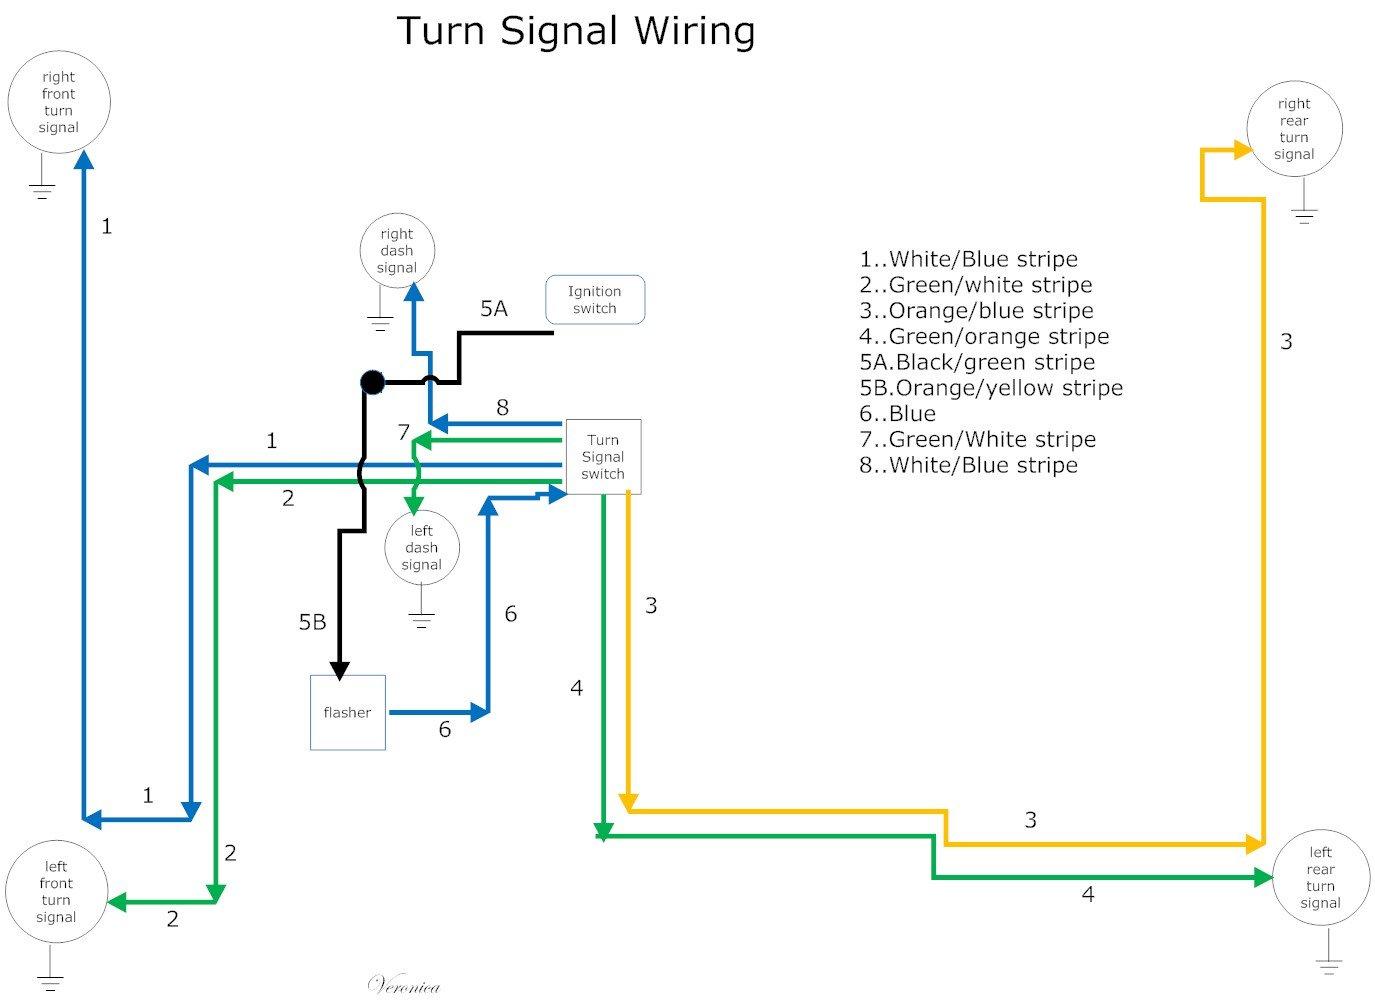 1966 Mustang Turn Signal Wiring Diagram - Word Wiring Diagram  progress-execution - progress-execution.lalunacrescente.it | Turn Signal Wiring Diagram For 1997 Ford Mustang |  | La Luna Crescente